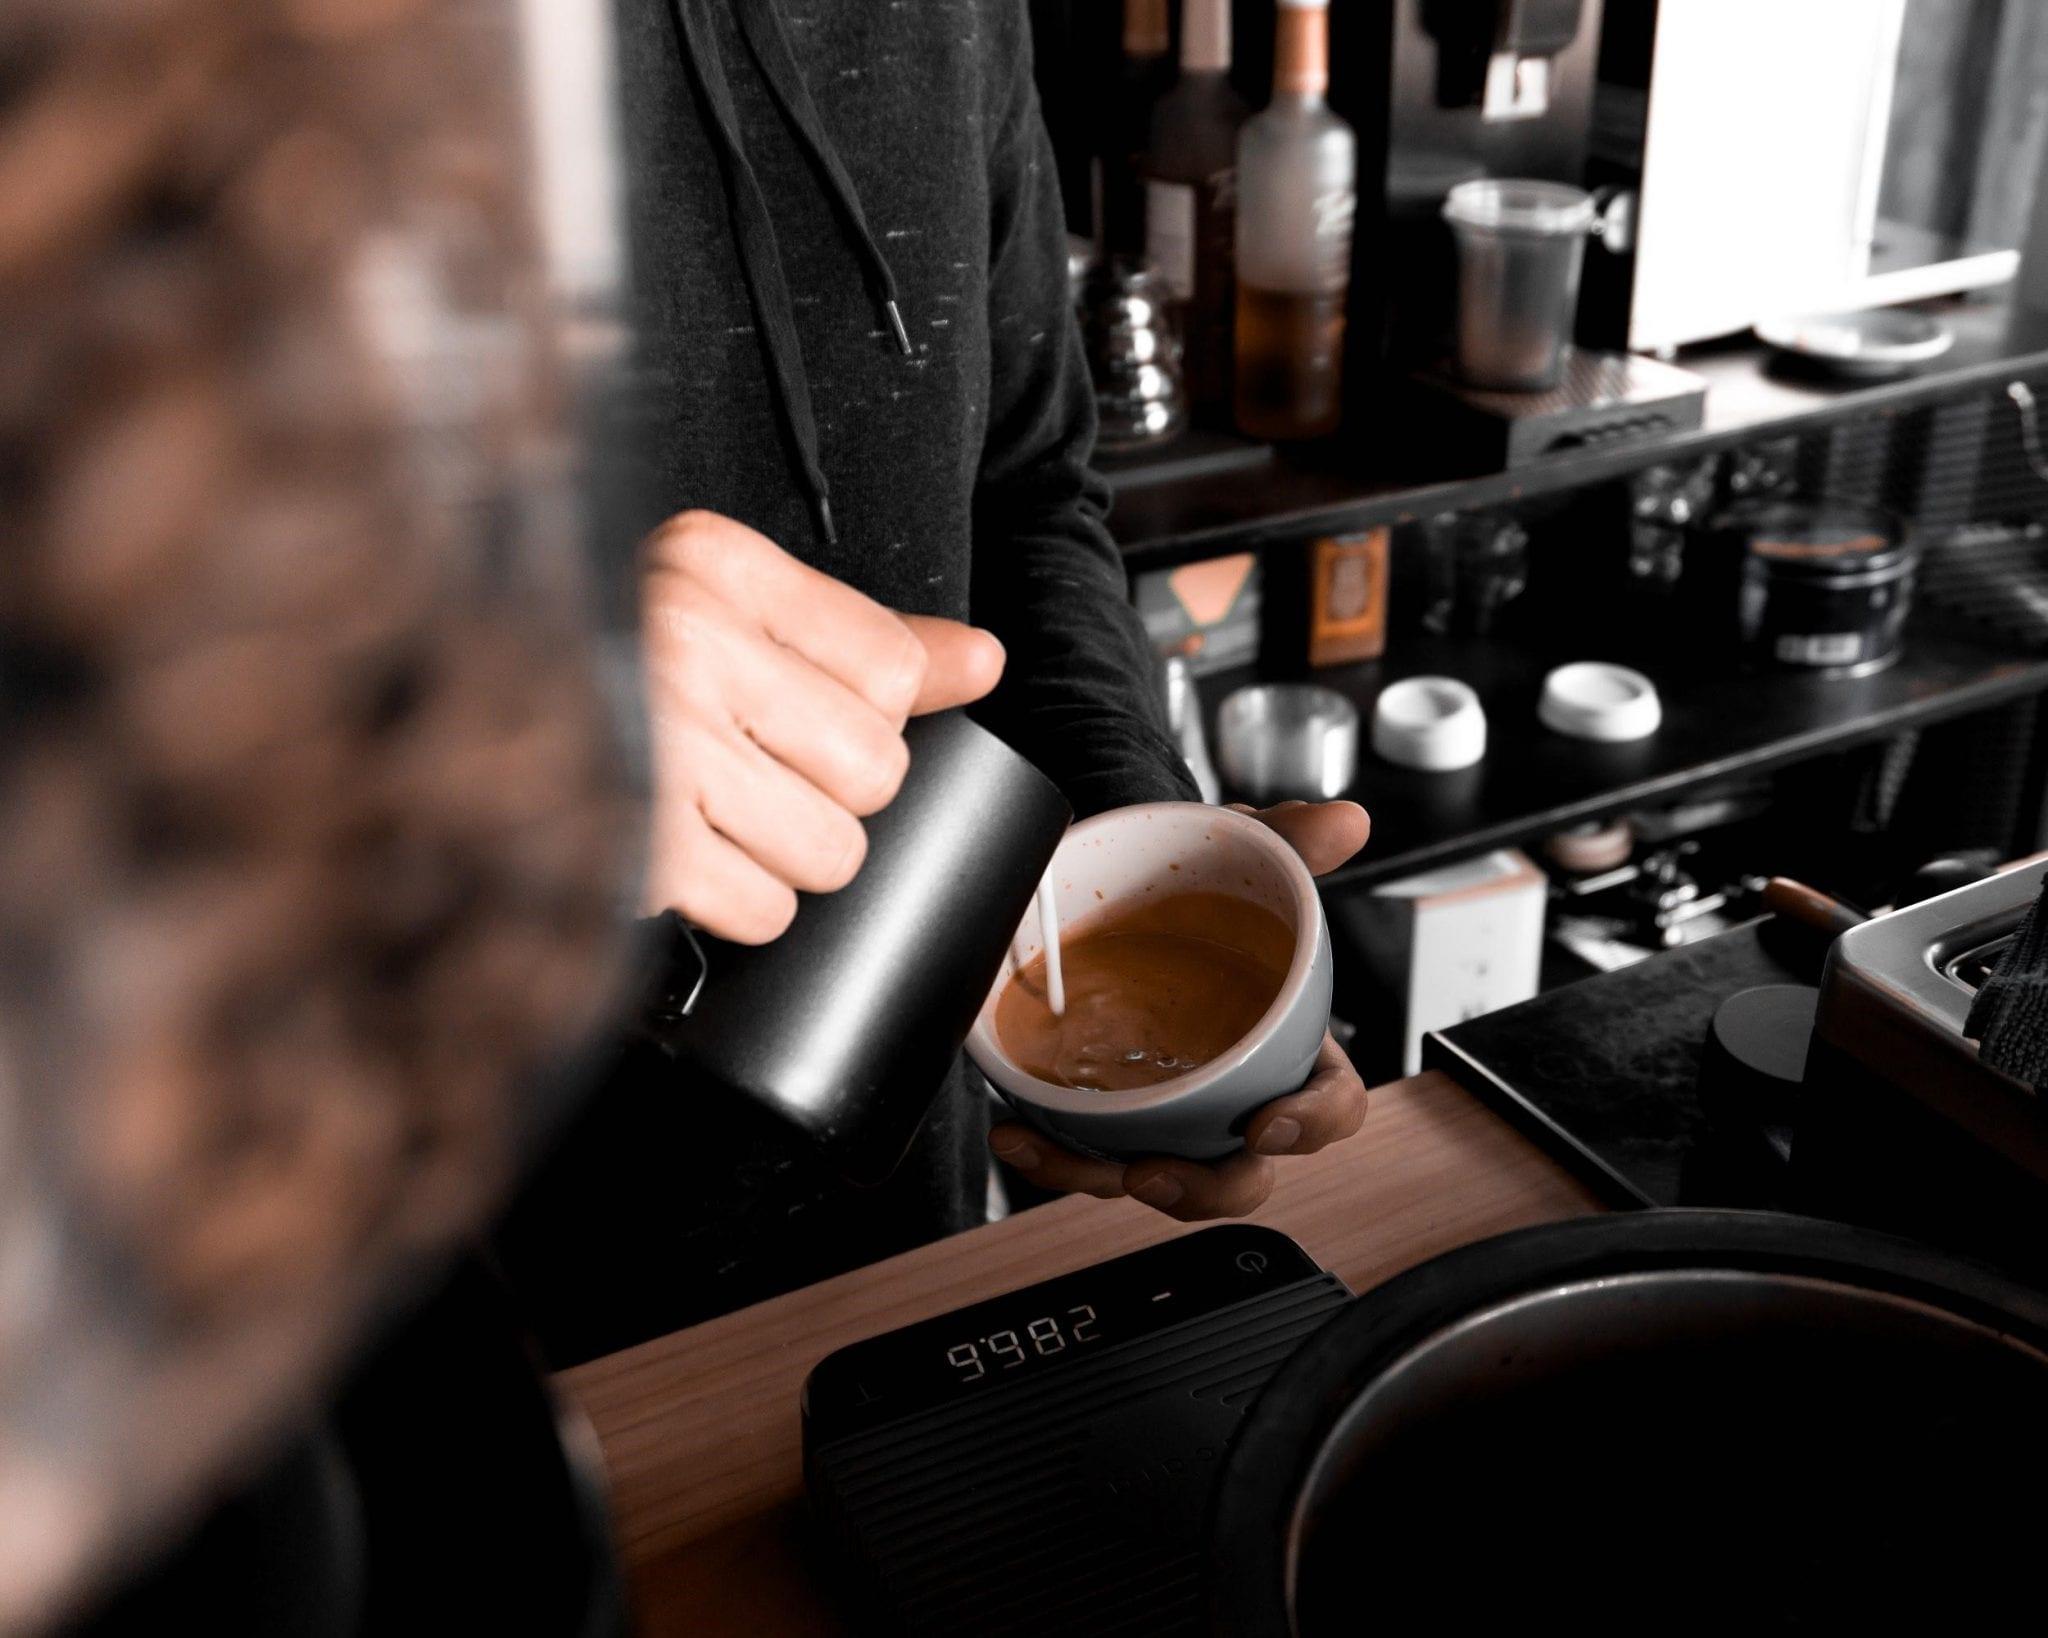 Barista prepares a cappuccino